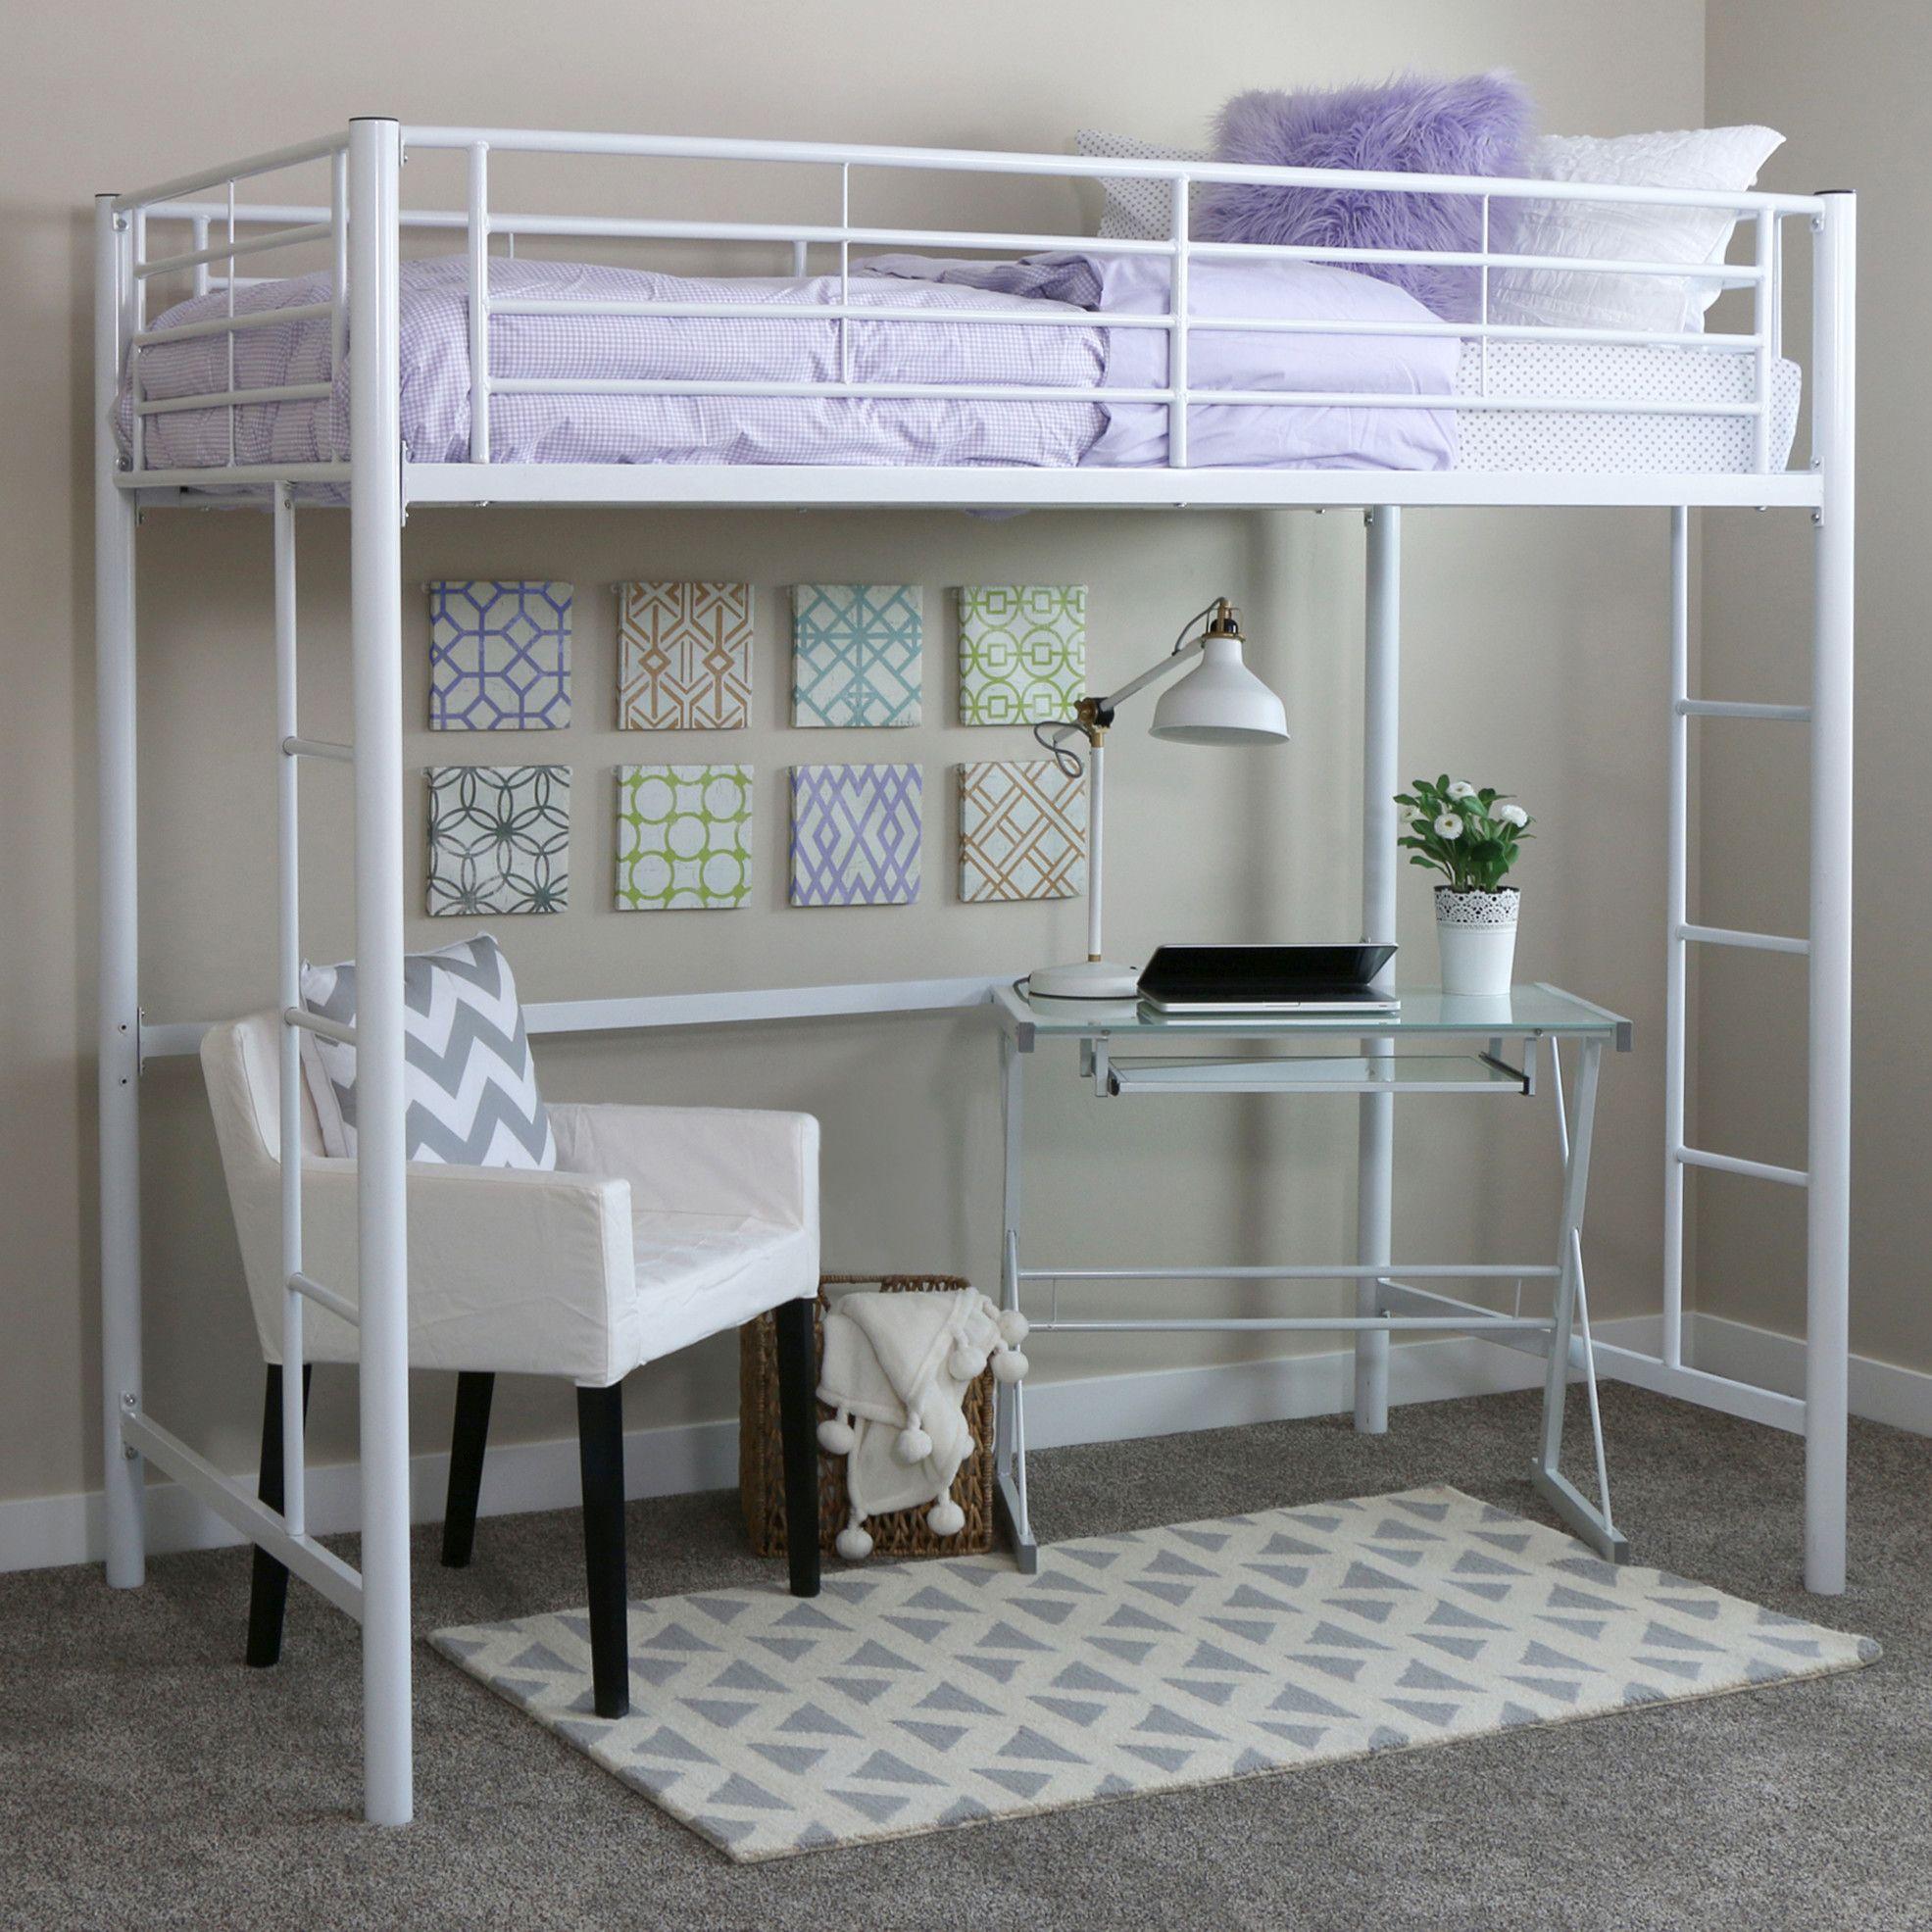 Twin loft bed ideas  Home Loft Concept Twin Loft Bed with BuiltIn Ladder u Reviews